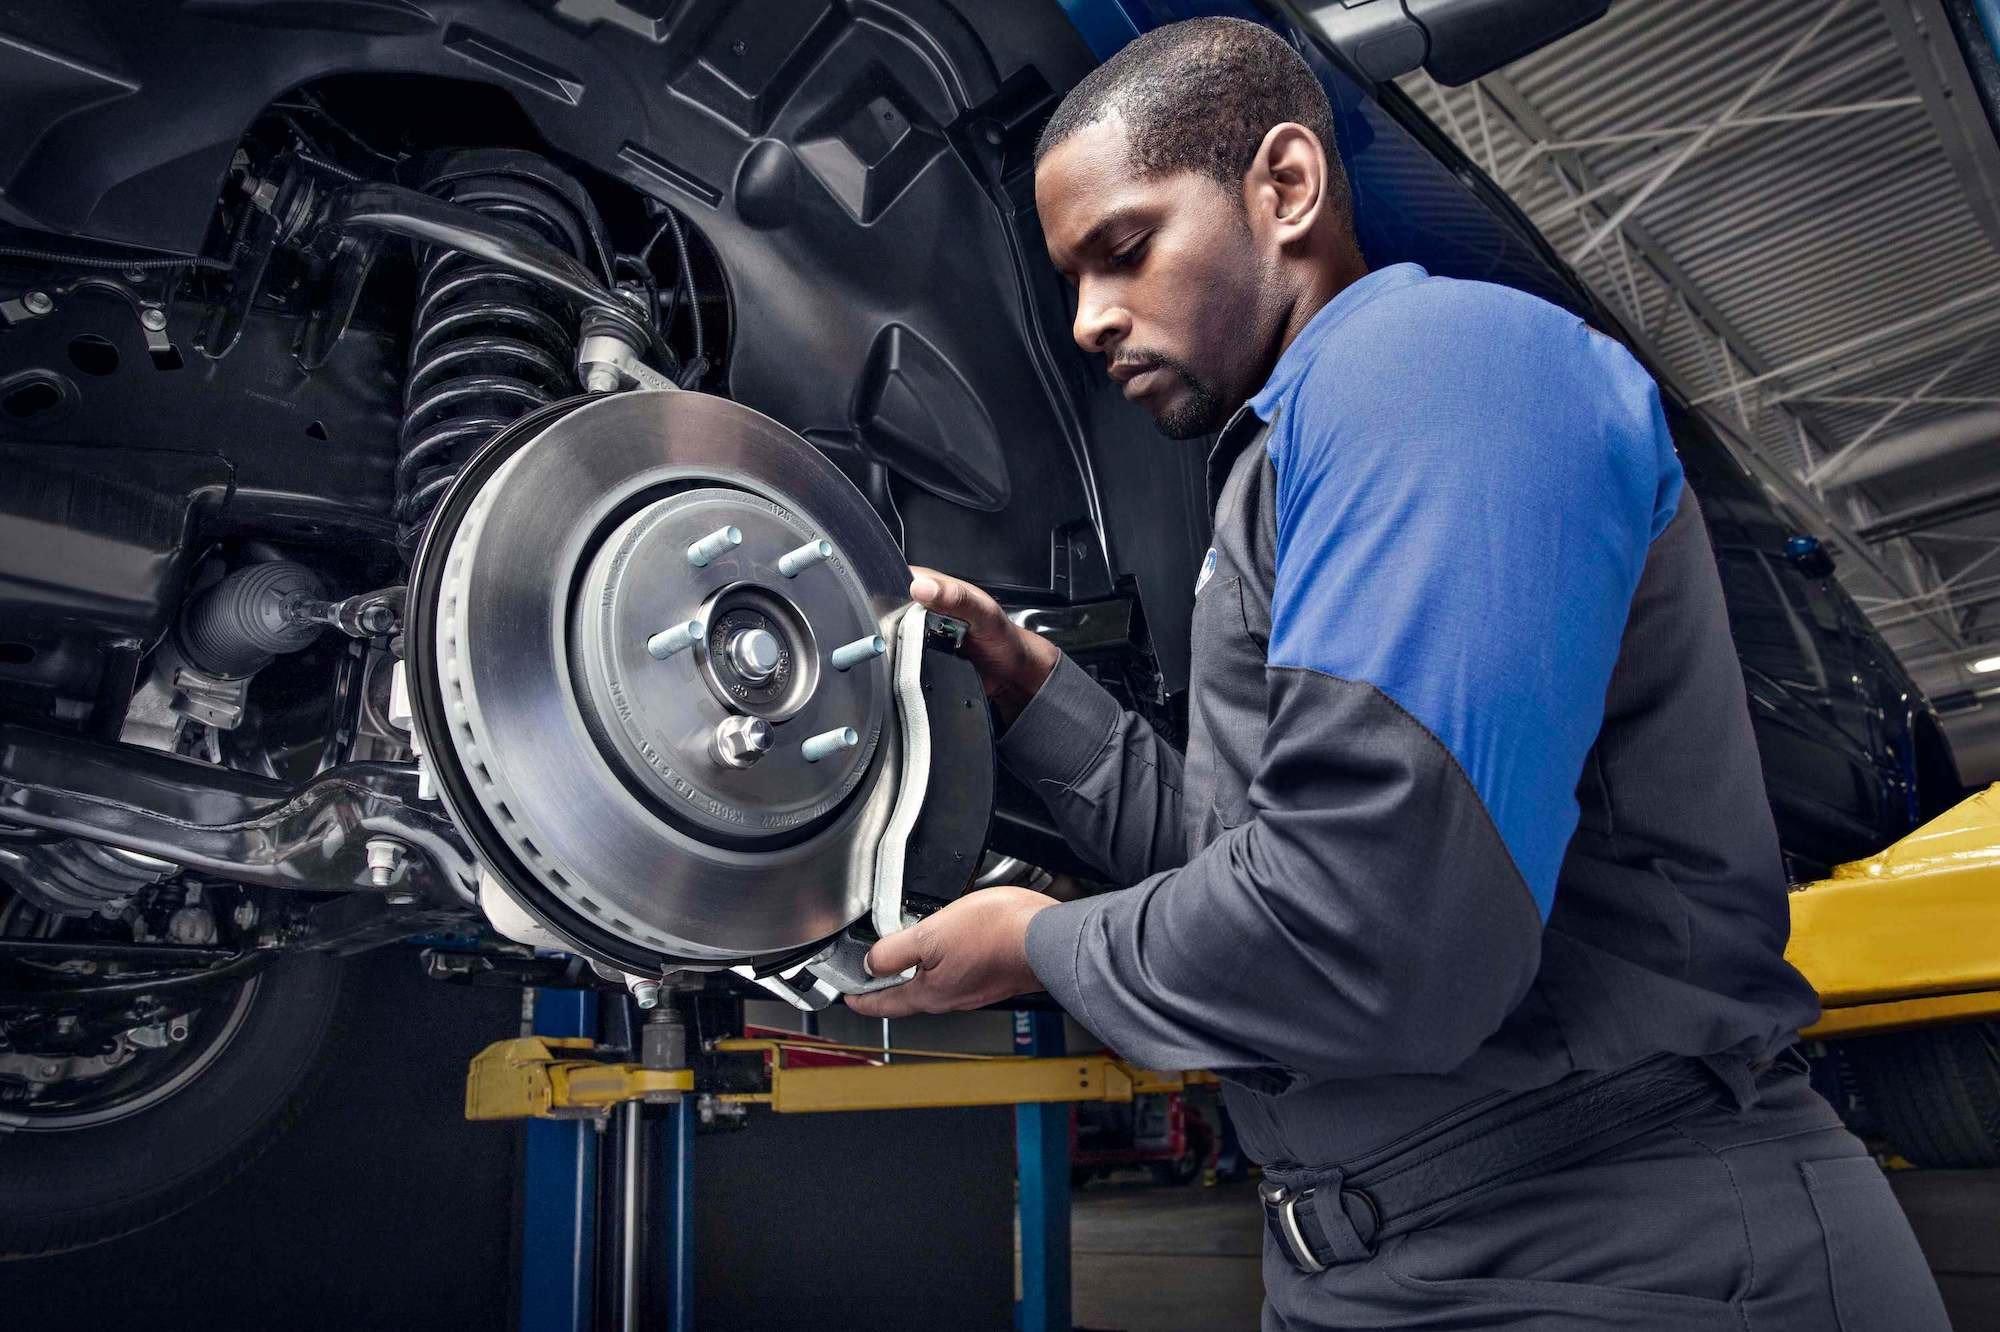 Quick Lane - Service Technician Changing Brakes